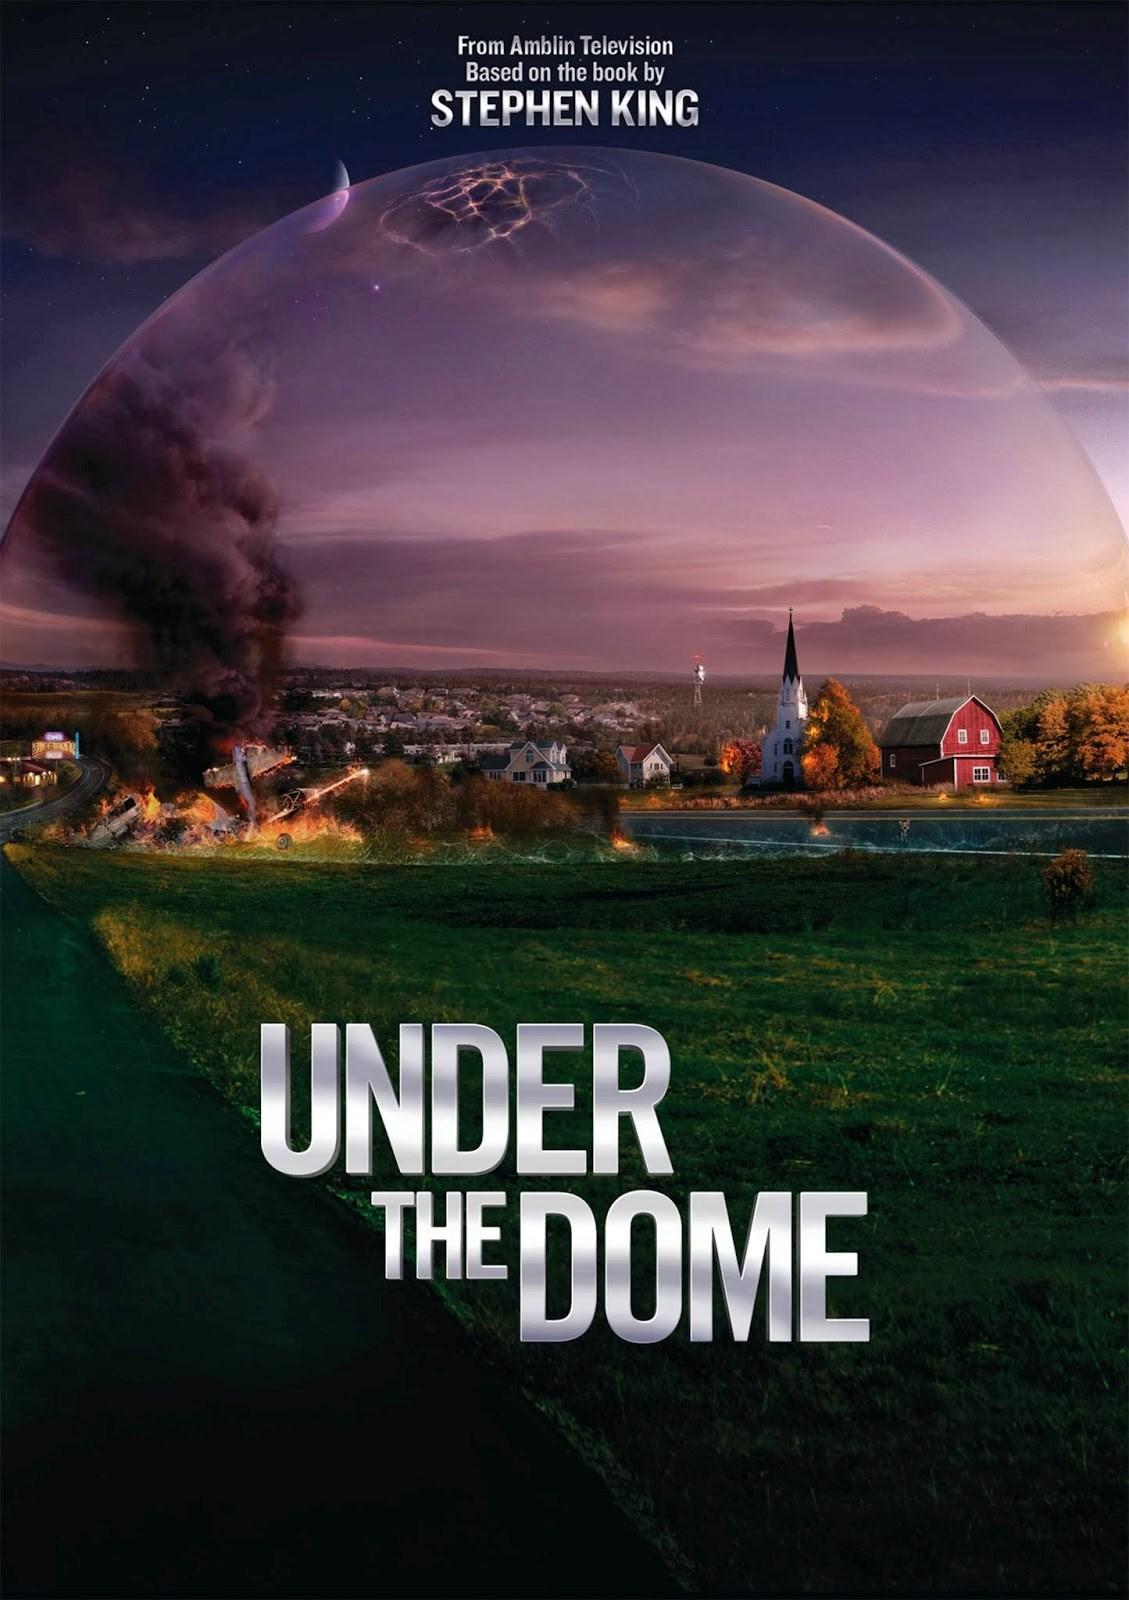 第08集.穹顶之下.Under.the.Dome.S03E09.720p.WEB-DL.DD5.1.H.264 ...